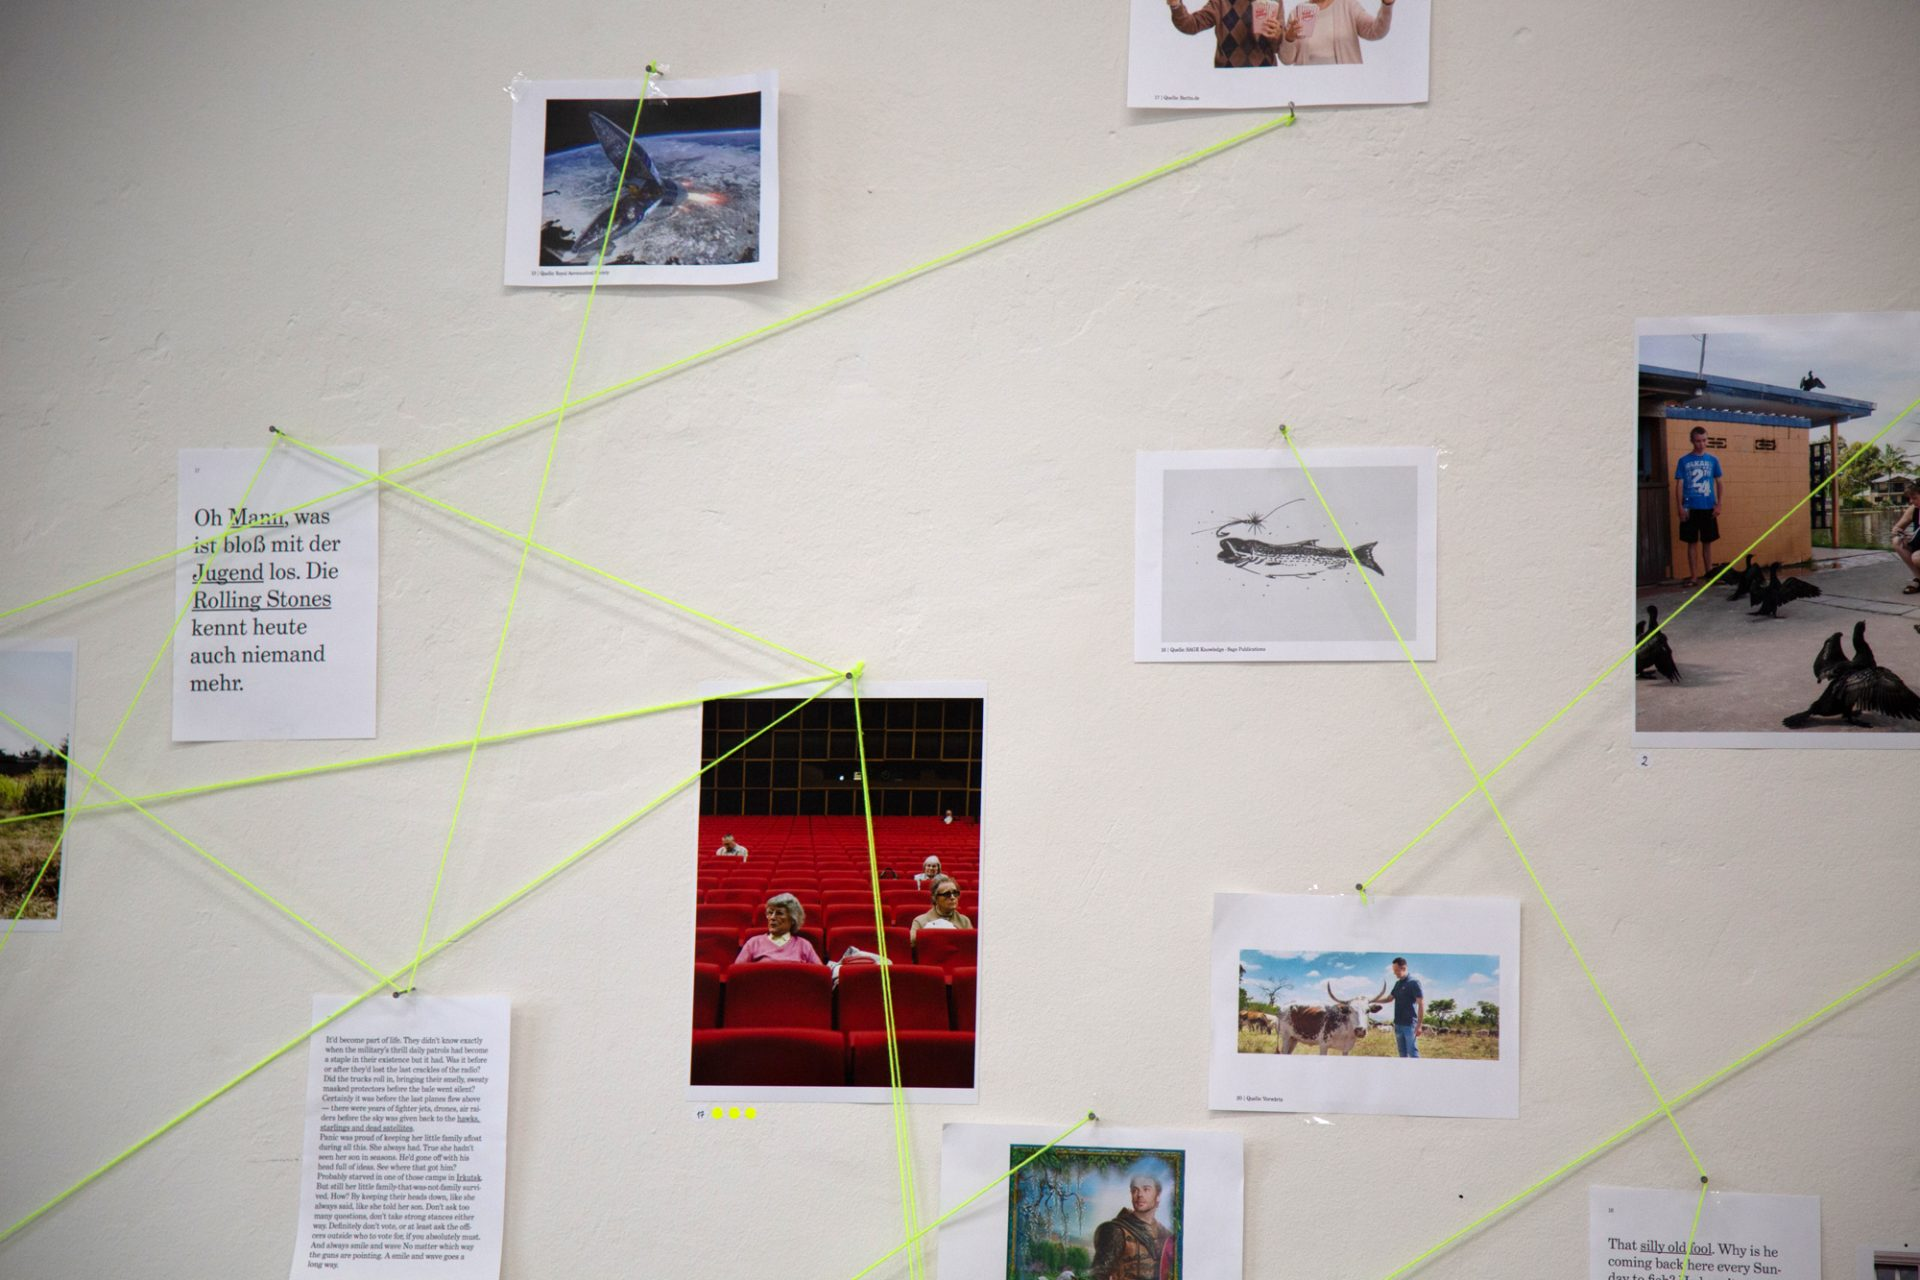 """Stiller Post"", 48 Stunden Neukölln Art Festival, Berlin, 2019"